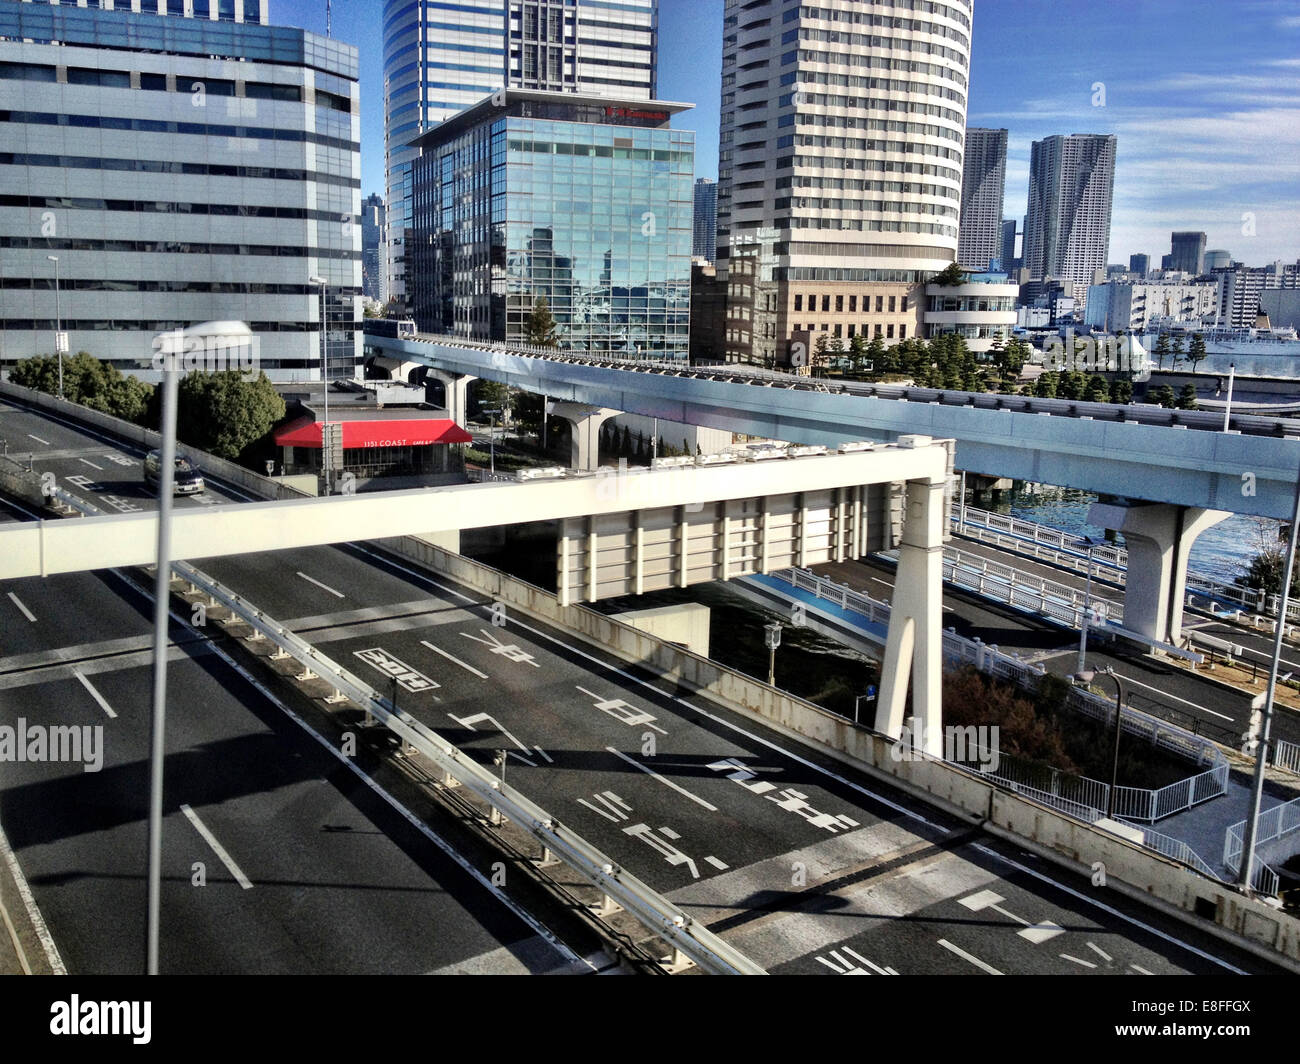 Japan, Tokyo, City streets - Stock Image